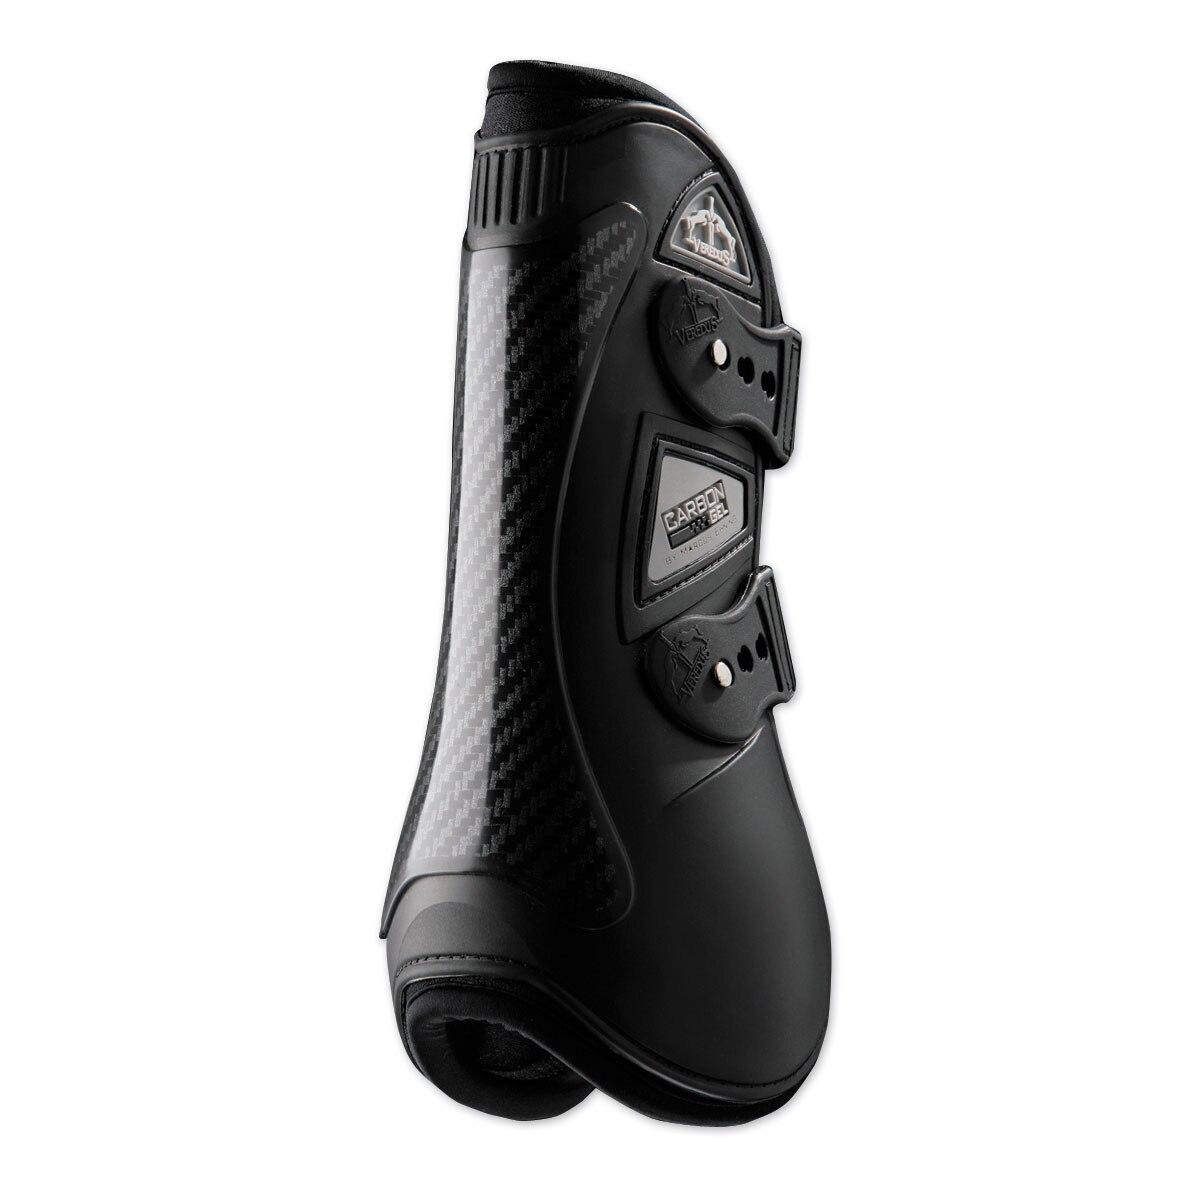 Veredus Carbon Gel Open Front Boots